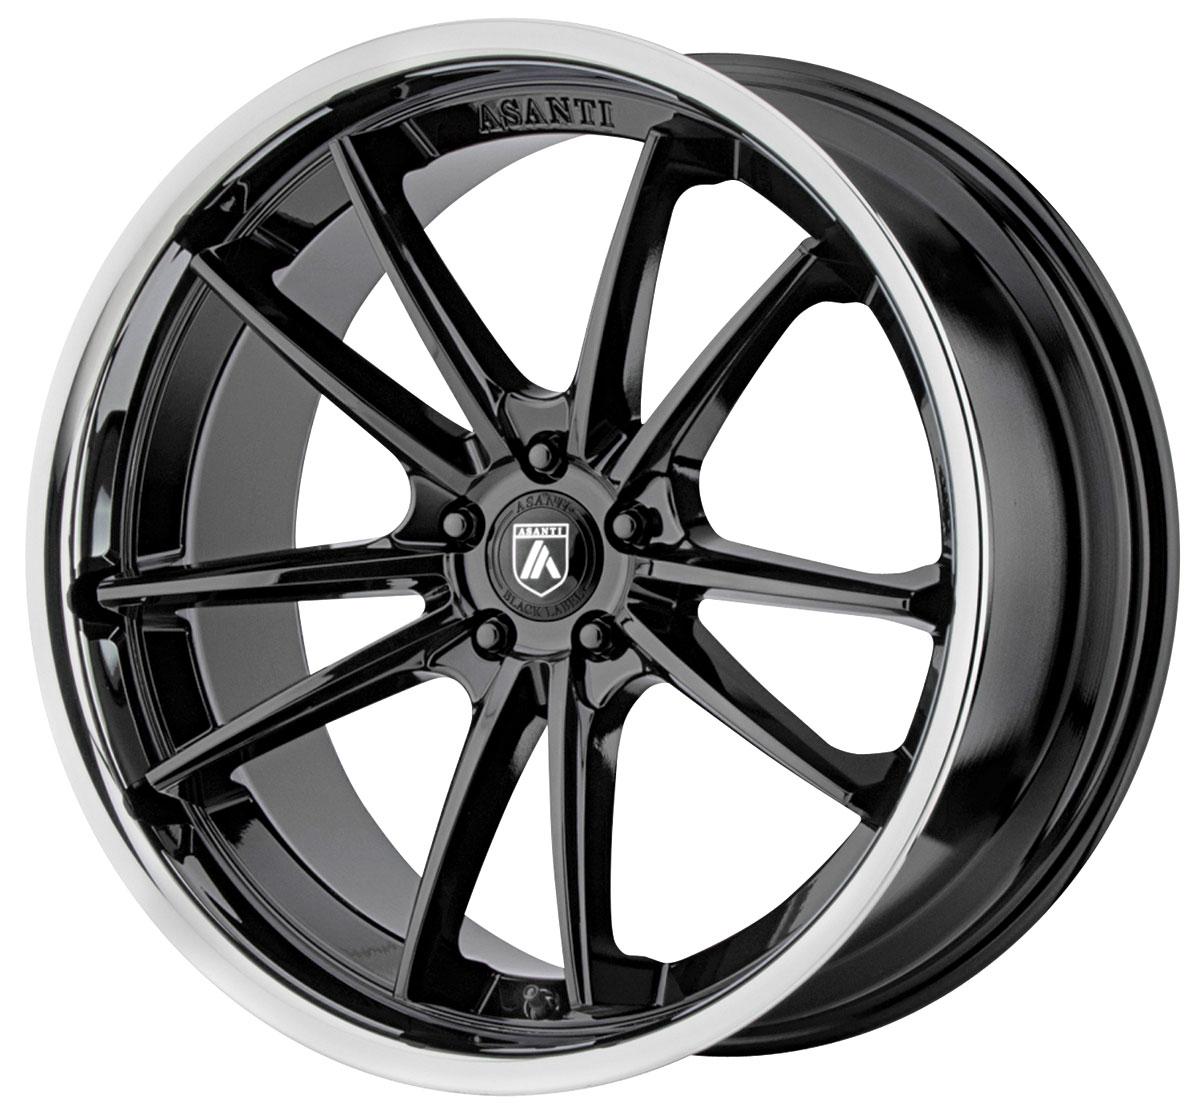 Wheel, Asanti Black, DELTA, 2009-19 CTS/CTS-V, 20x9